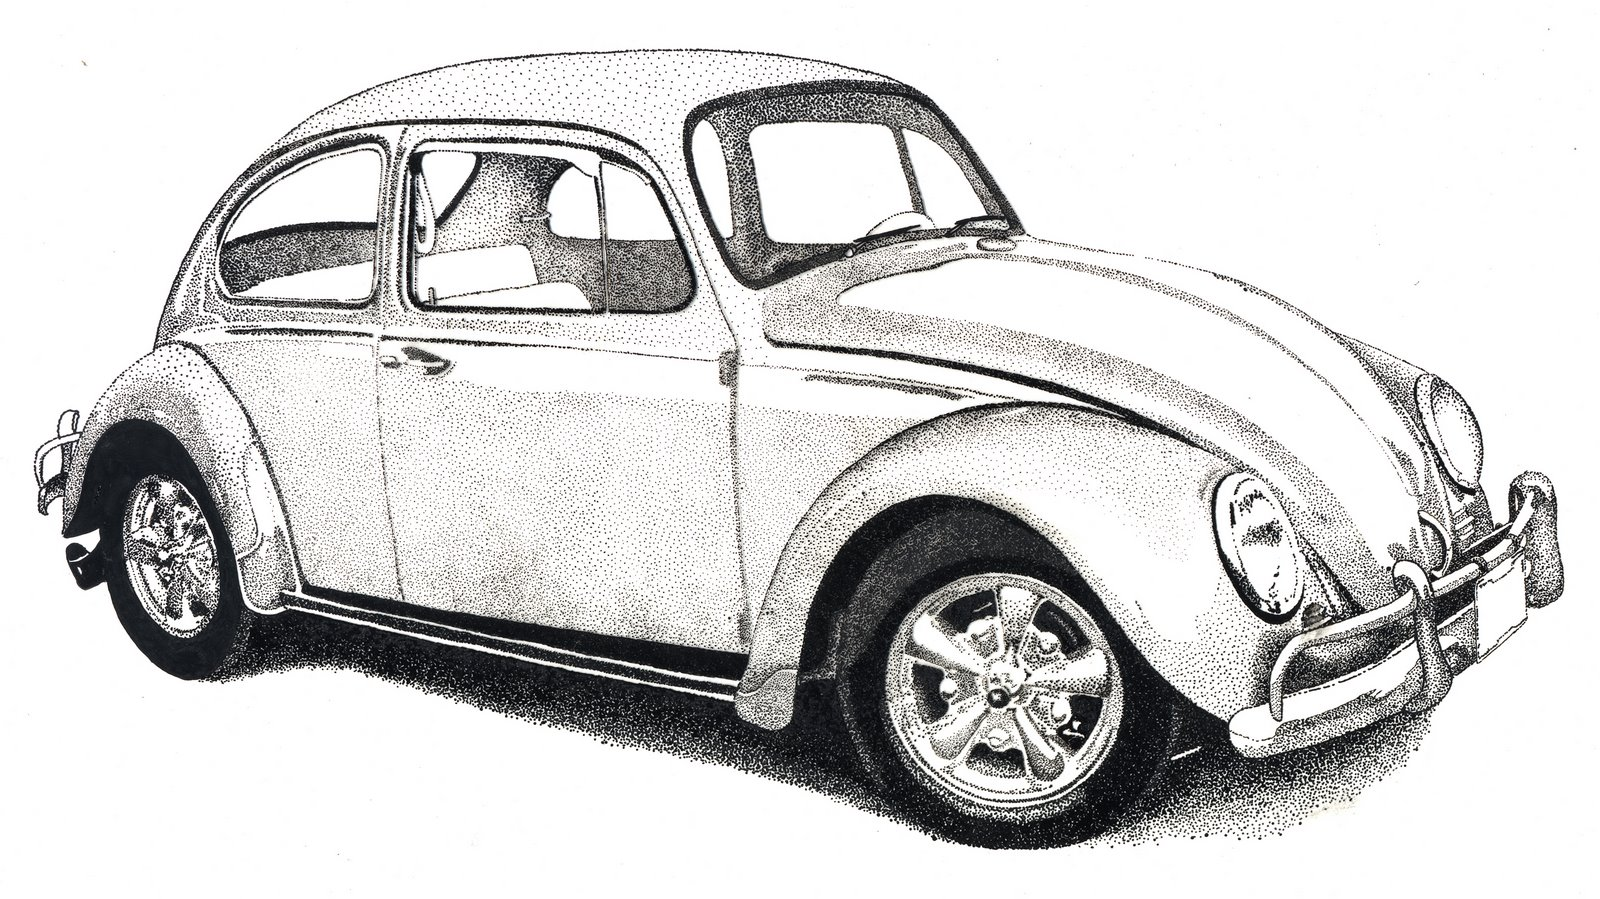 Drawn vehicle beetle Drawing VW Beetle Pencil Realistic